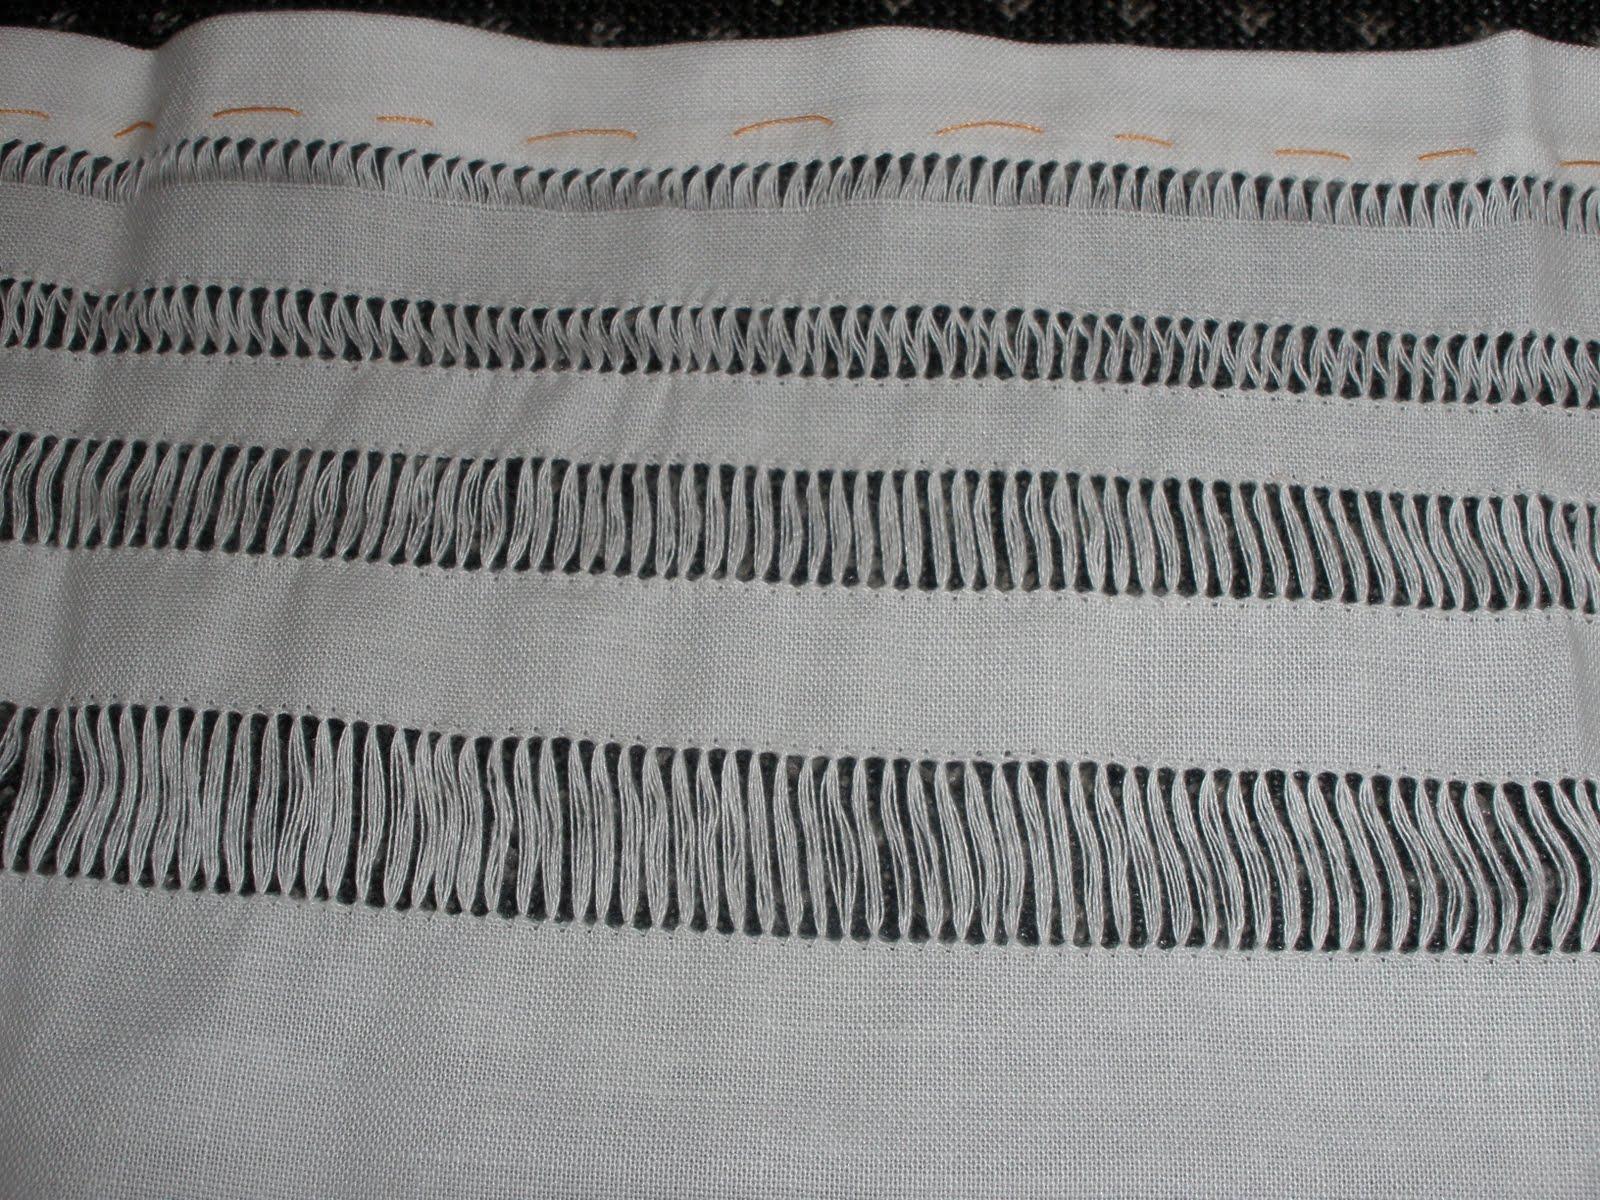 vainicas-bordado-telas-online